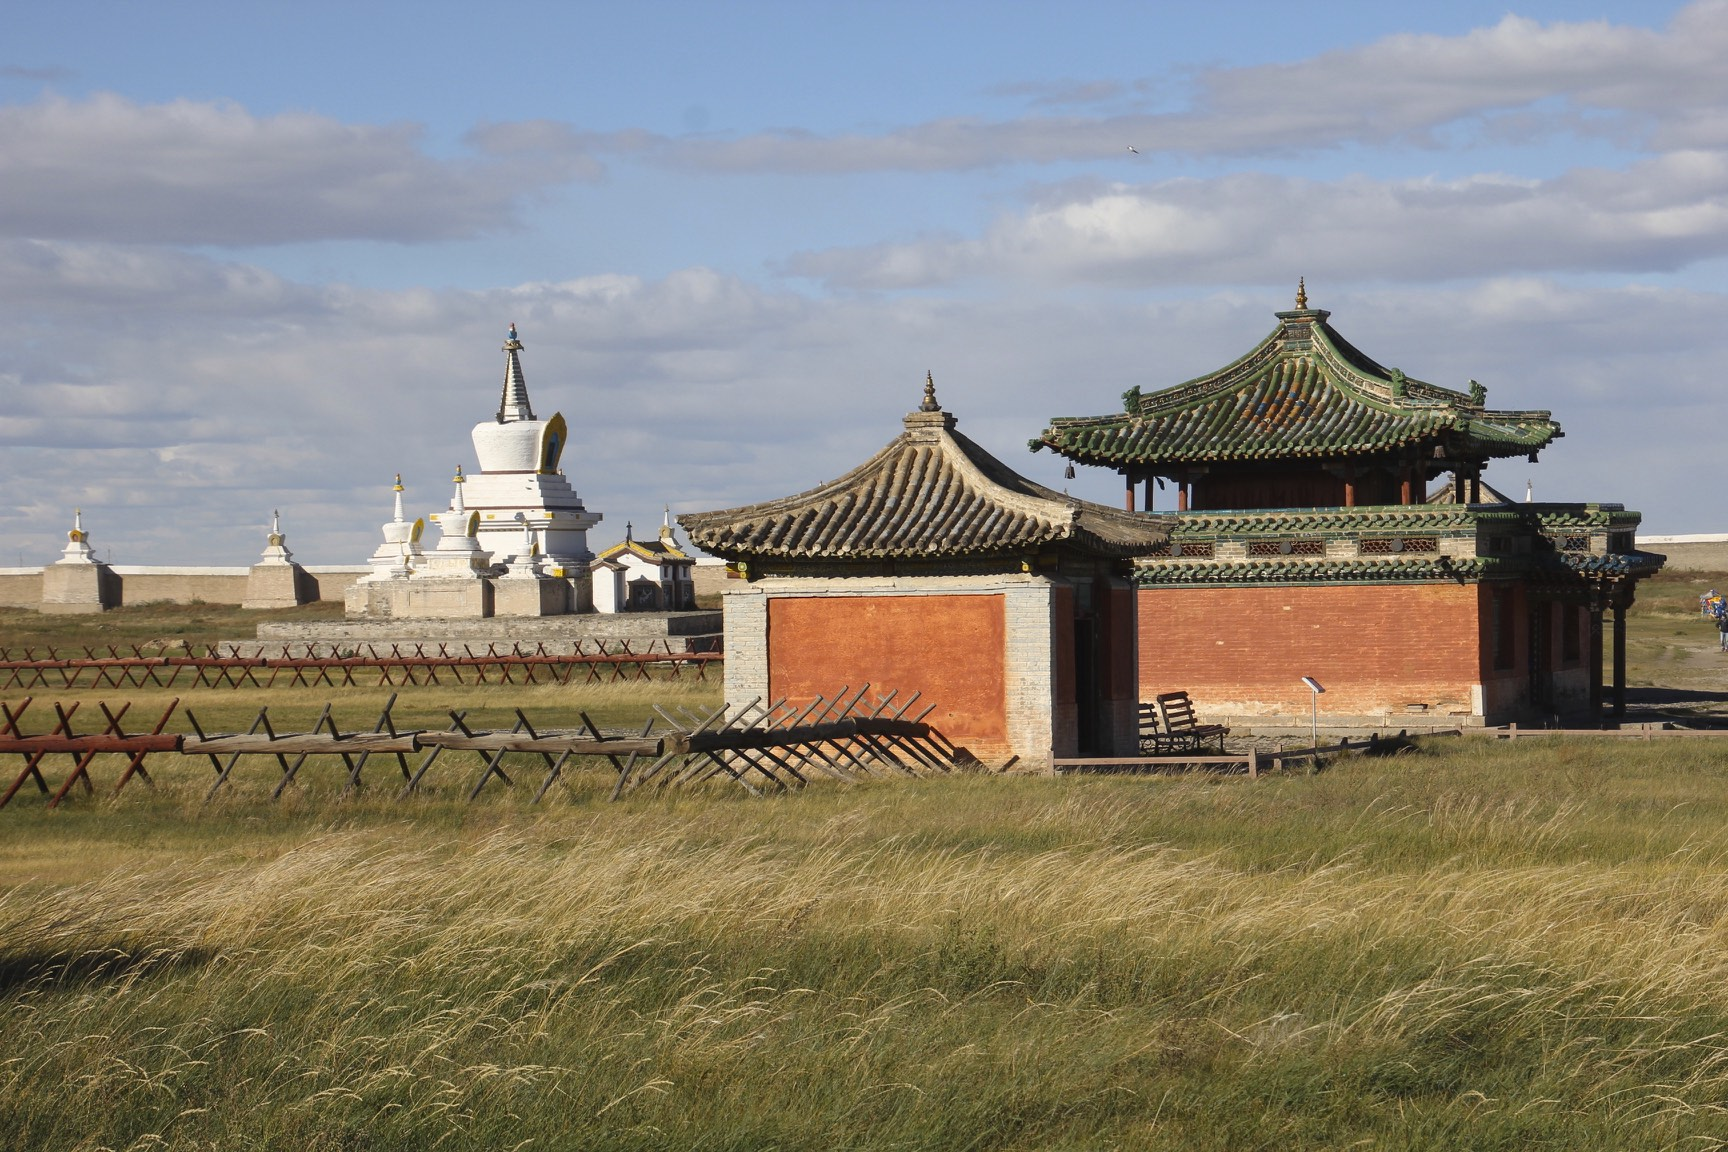 Karakorum - the capital of the Genghis Khan Empire